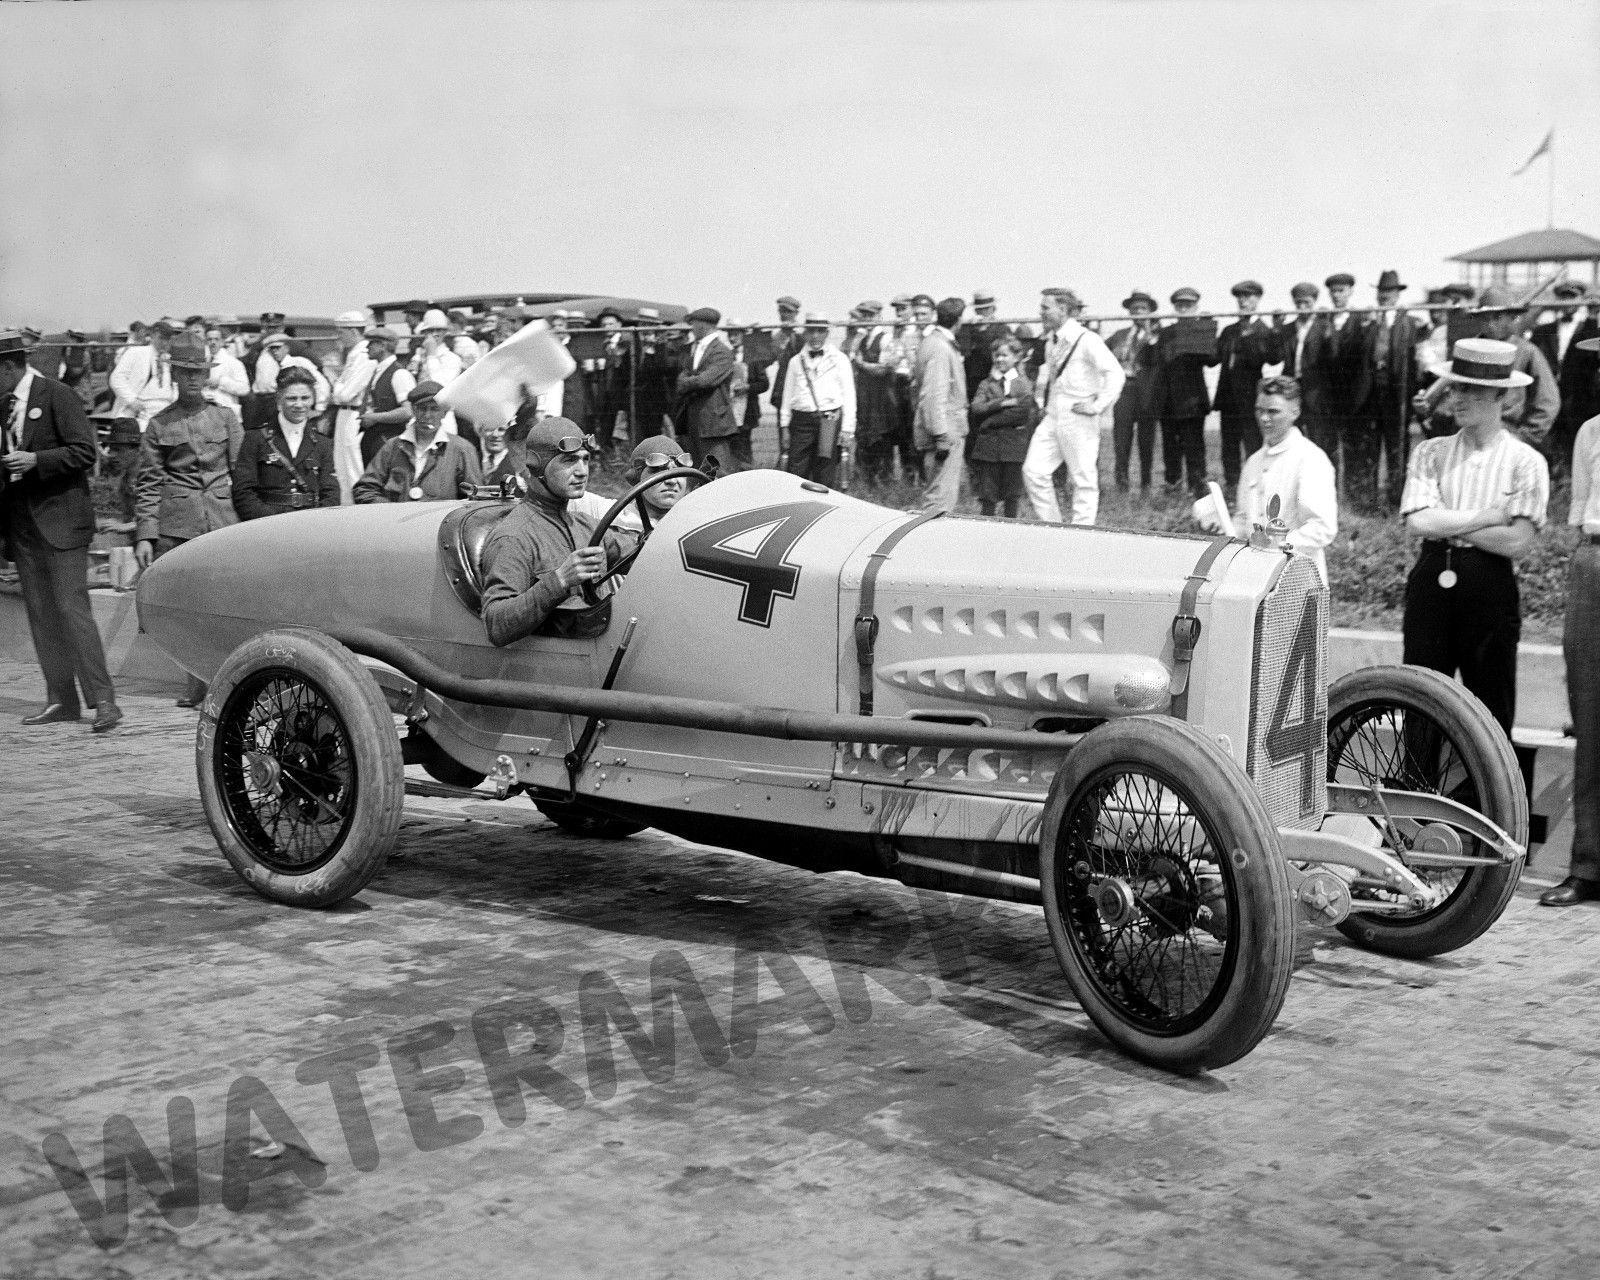 Photograph -Vintage Image Indy 500 Packard Race Car Ralph De Palma ...